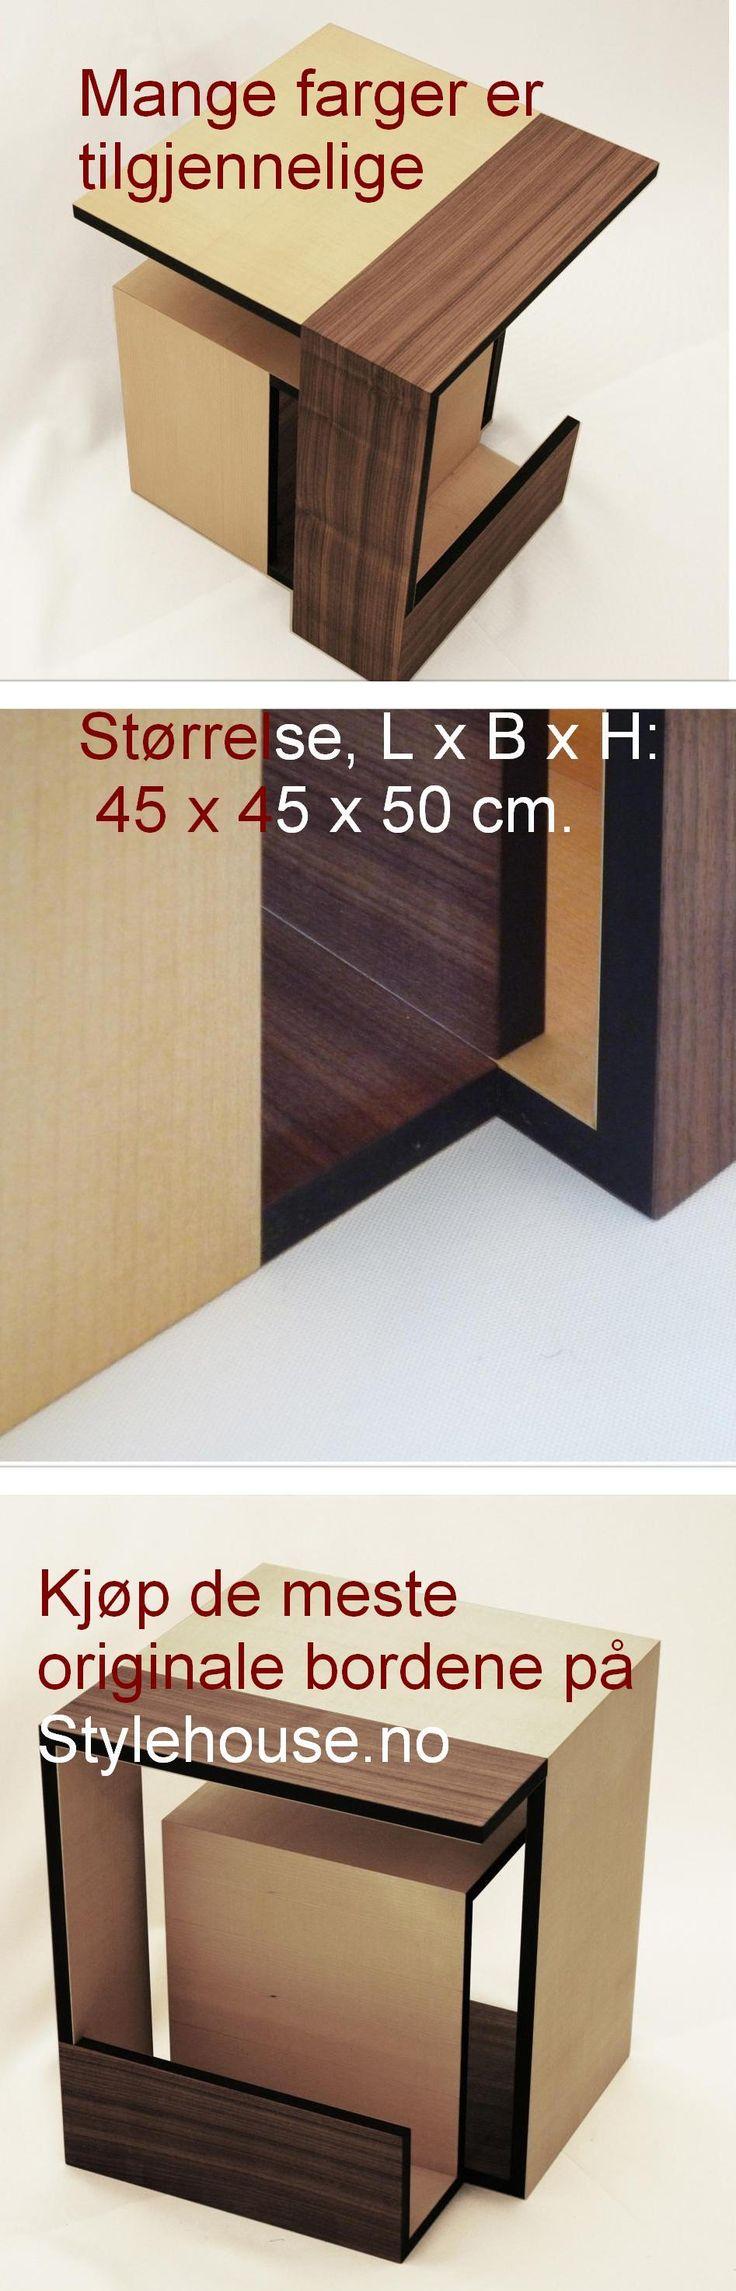 #originaltbord #originalebord #minimalistisk #stylehouse.no